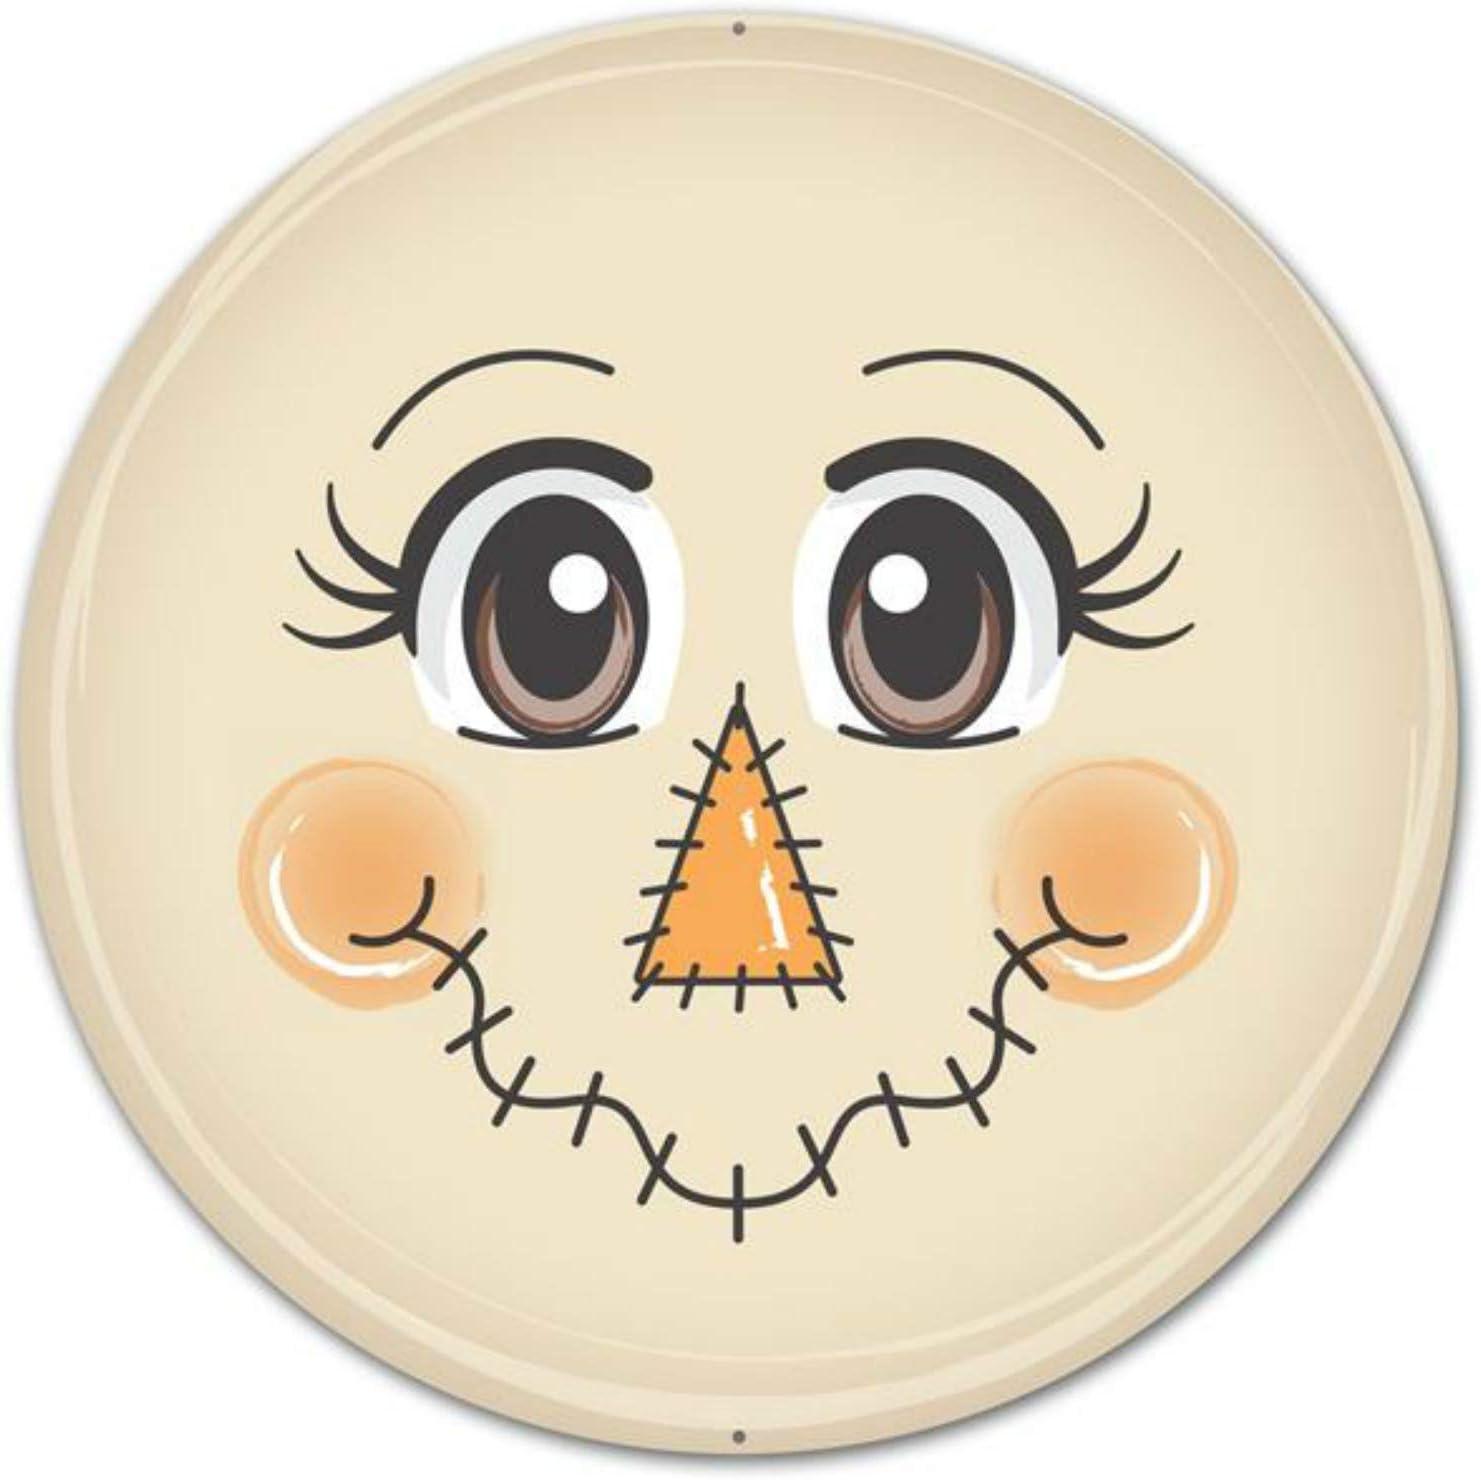 Craig Bachman 12 Metal Face Sign Scarecrow Autumn Fall Scarecrow Face Round Metal Sign Md0325 Amazon Ca Home Kitchen